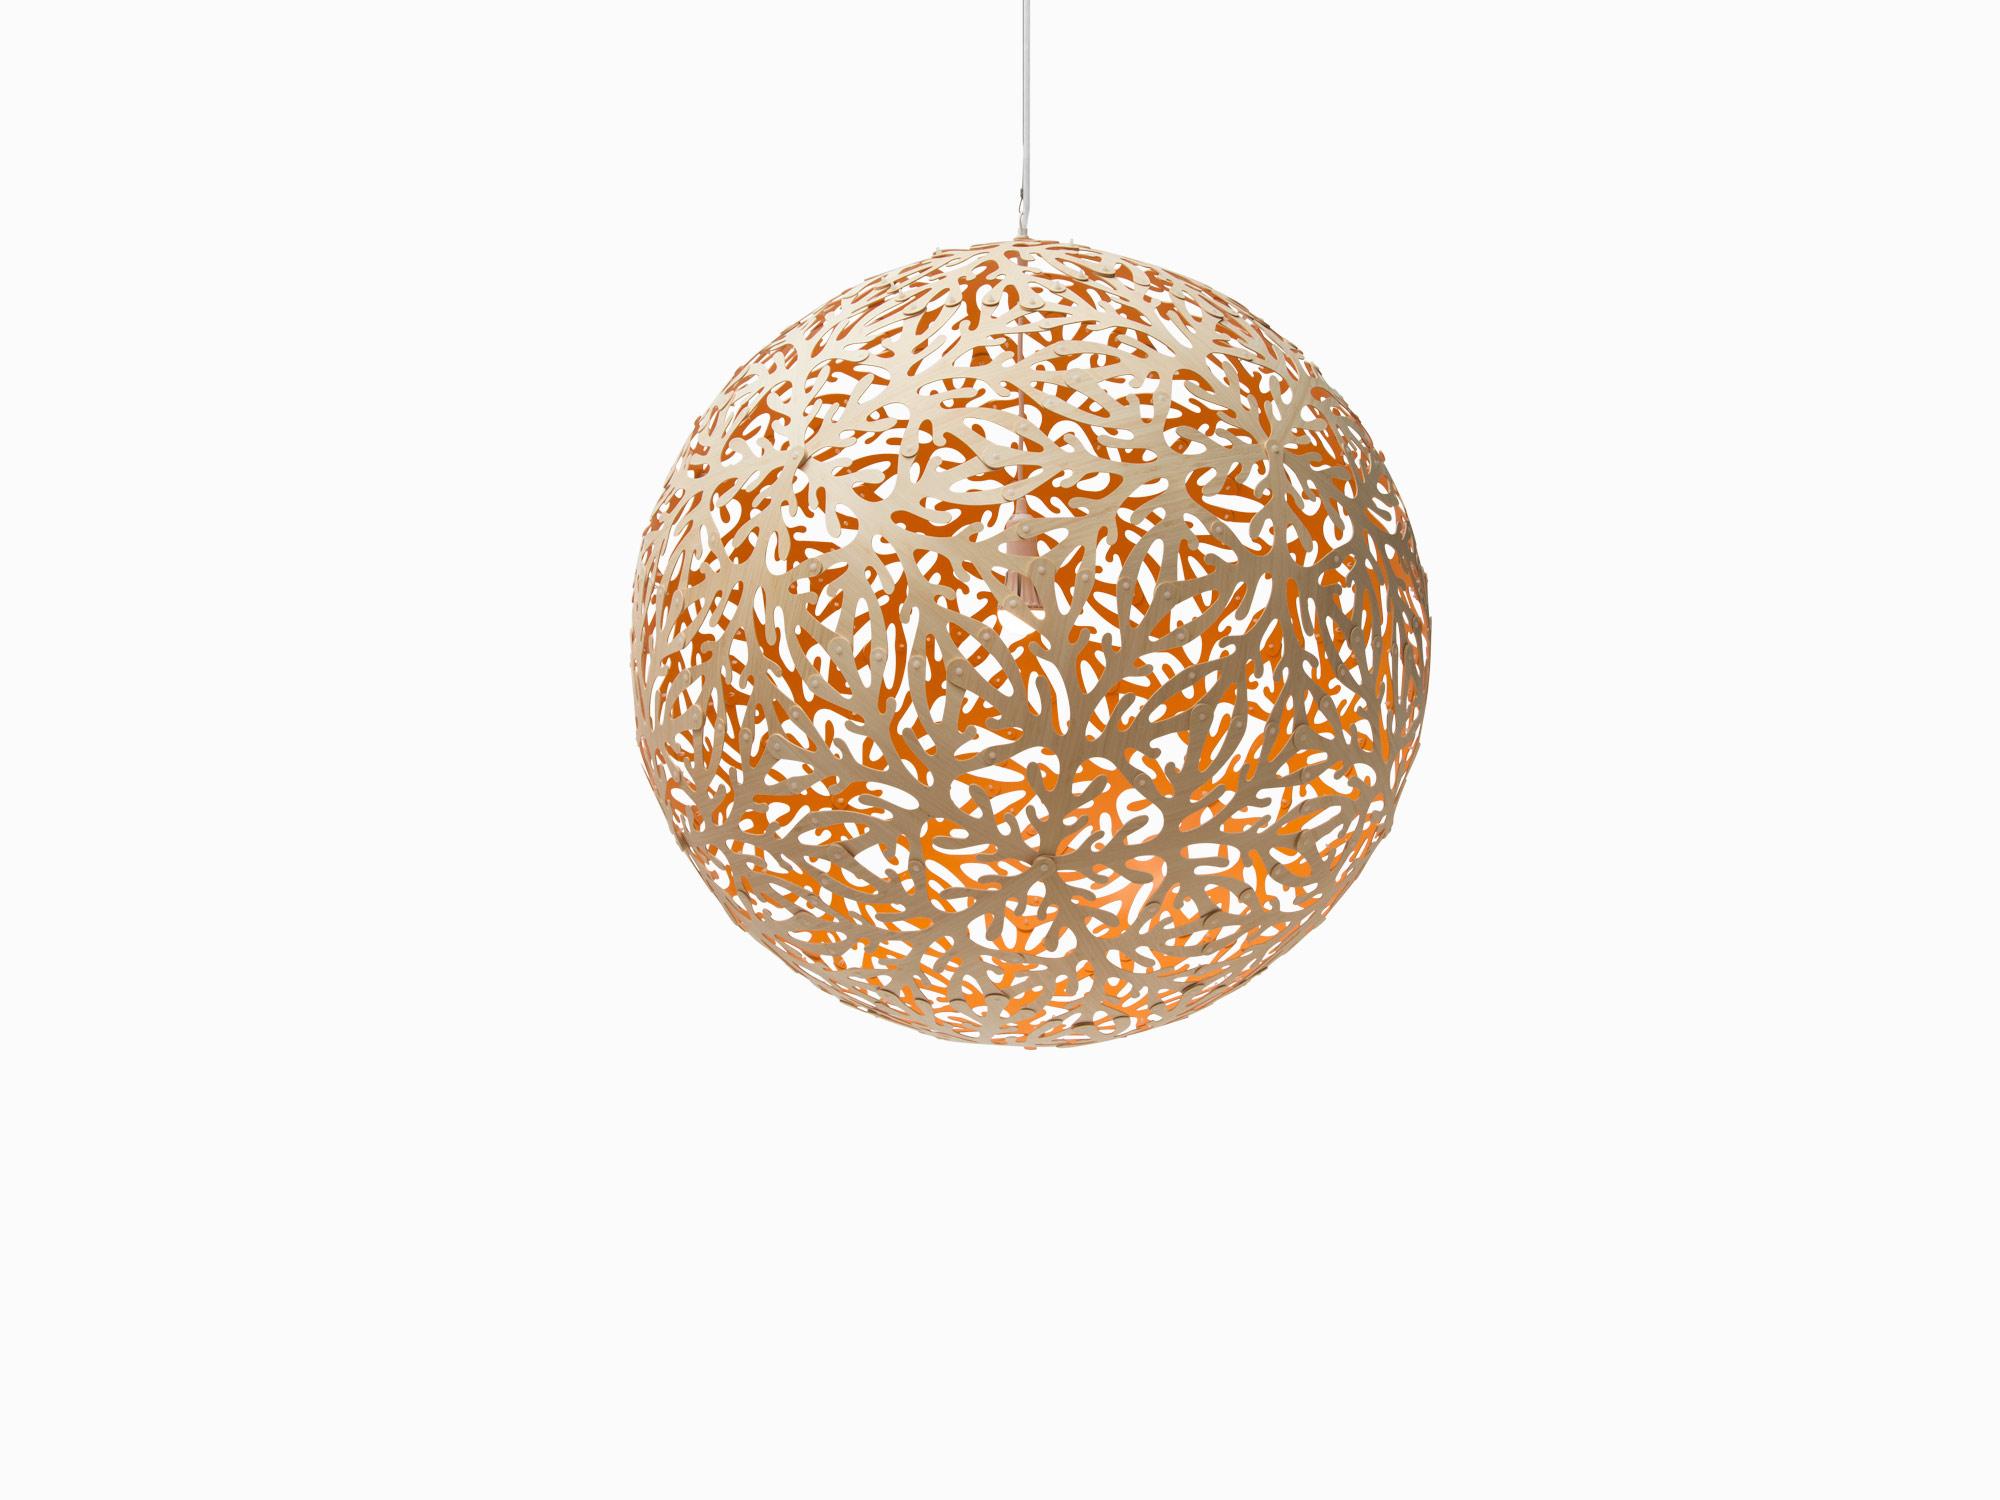 Sola 800 Bamboo Kitset, Natural/ Orange, $2475